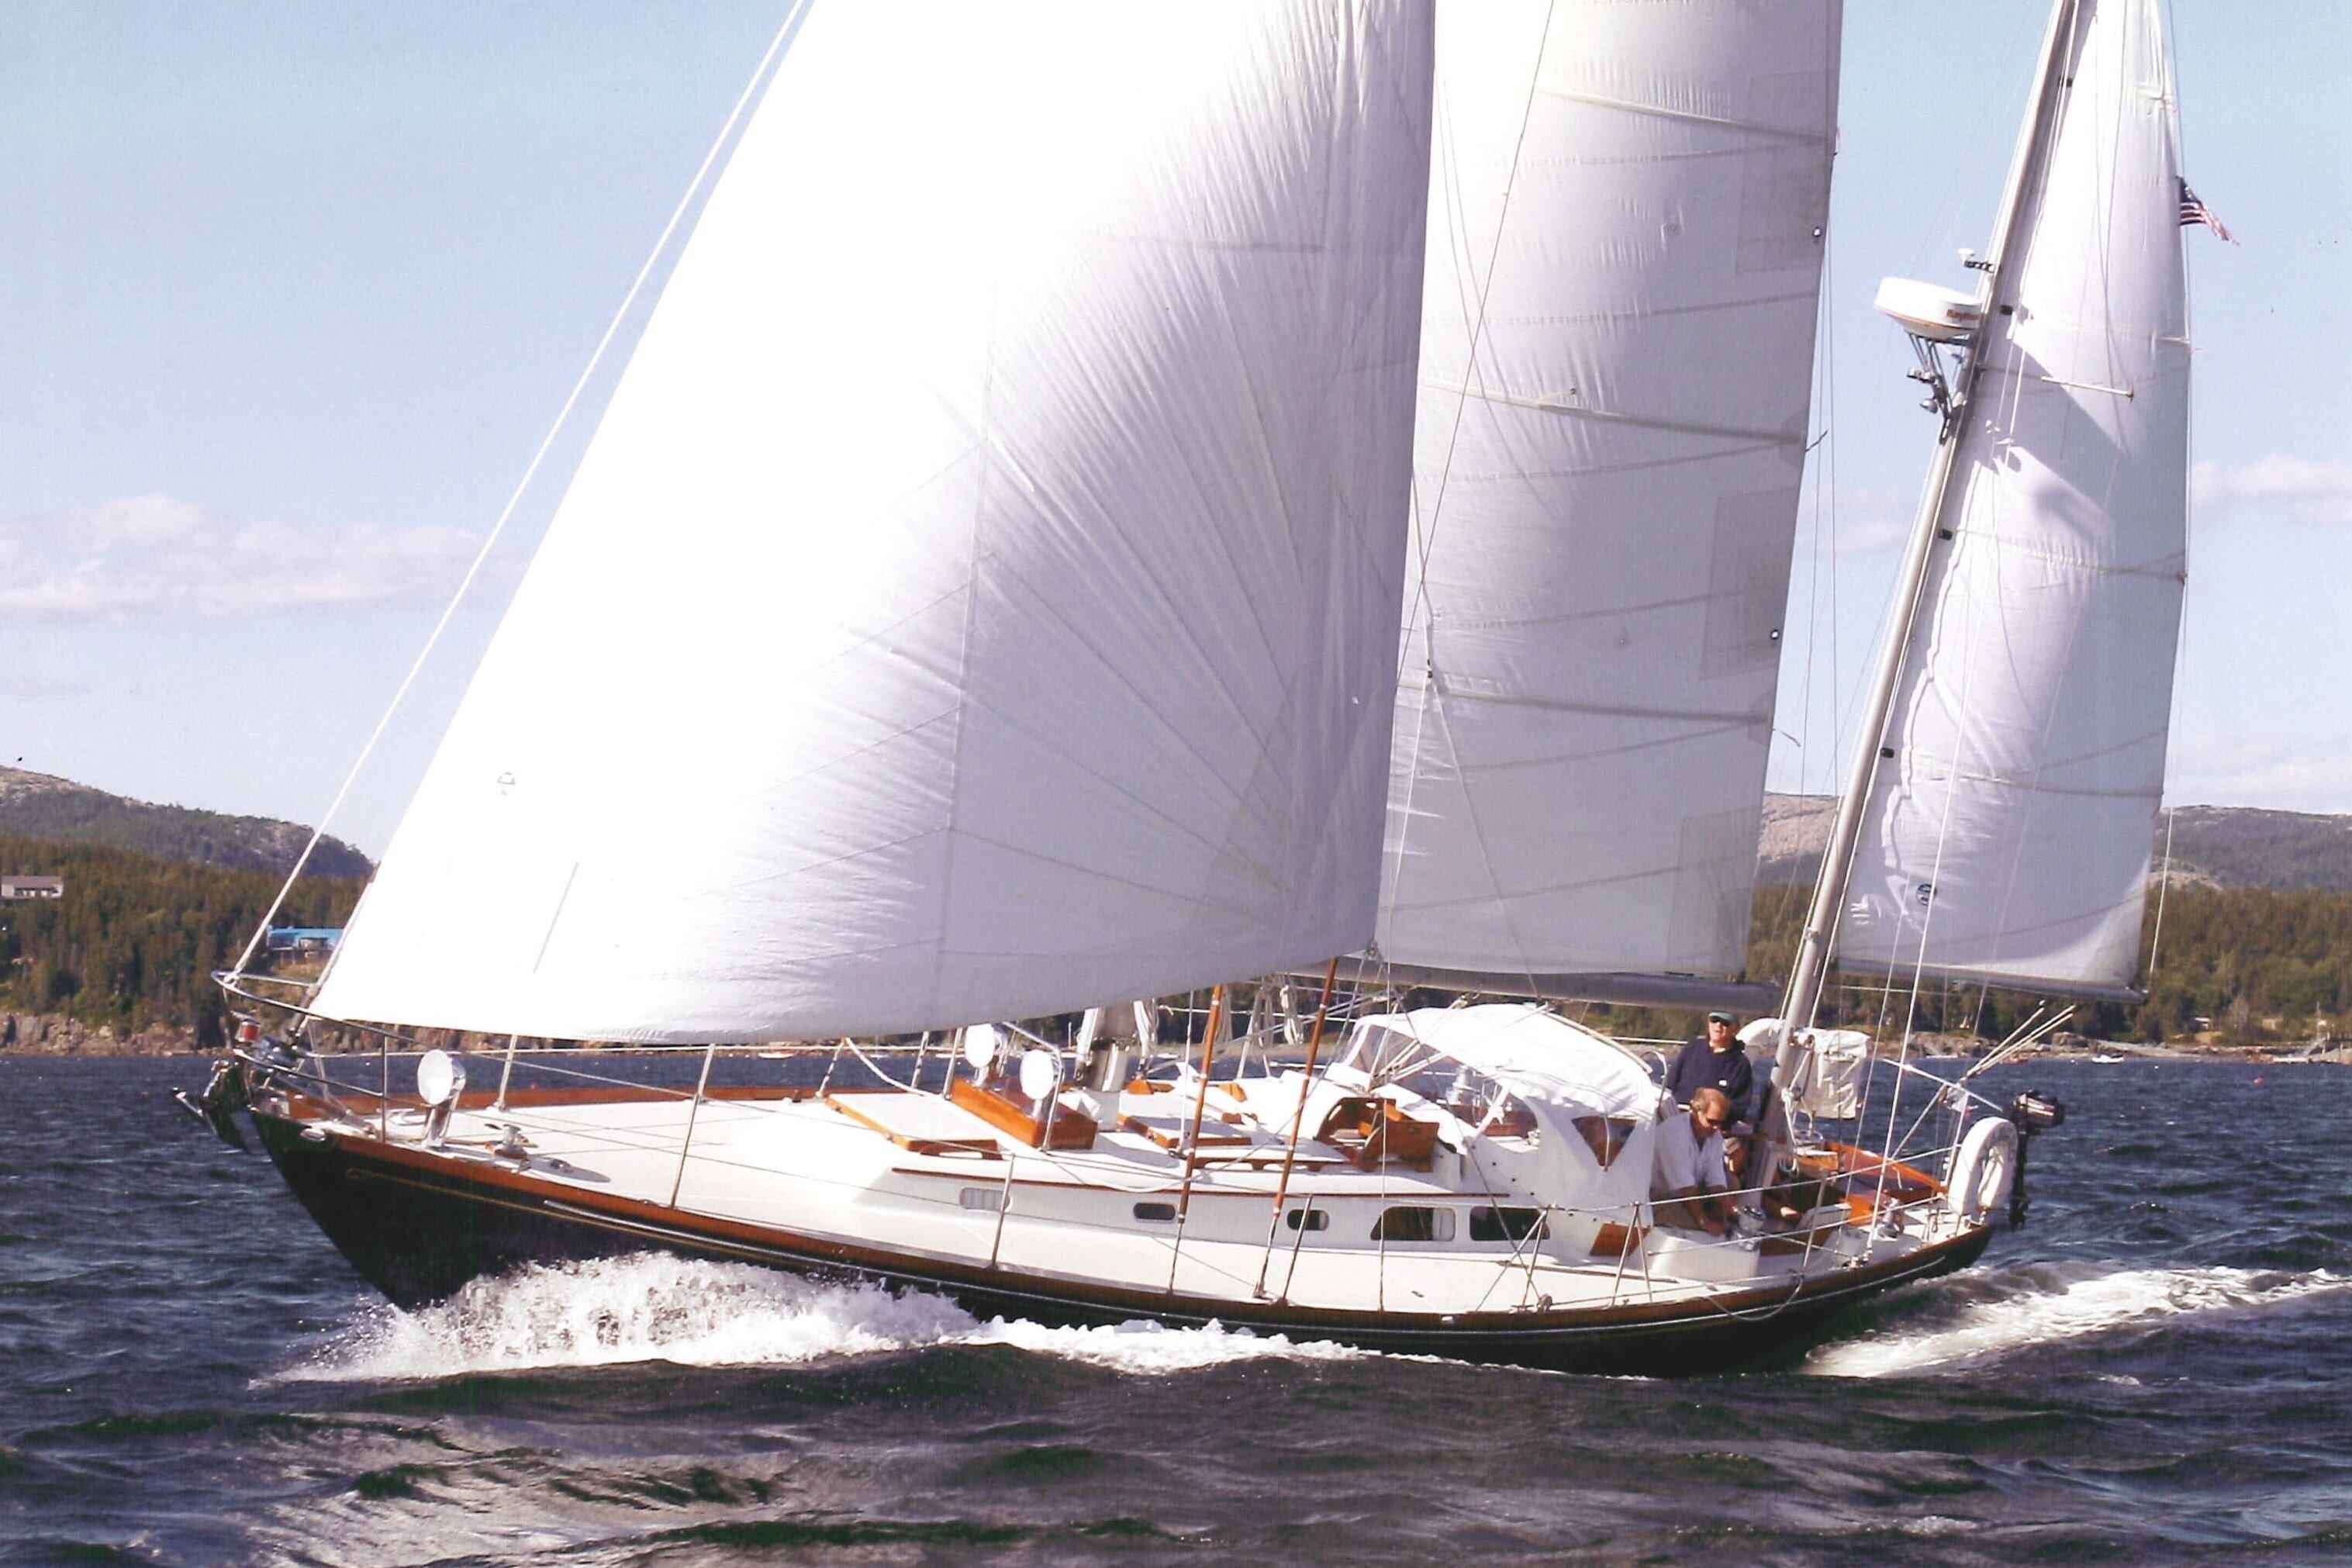 1977 Hinckley Sou wester 50 Yawl Sail Boat For Sale